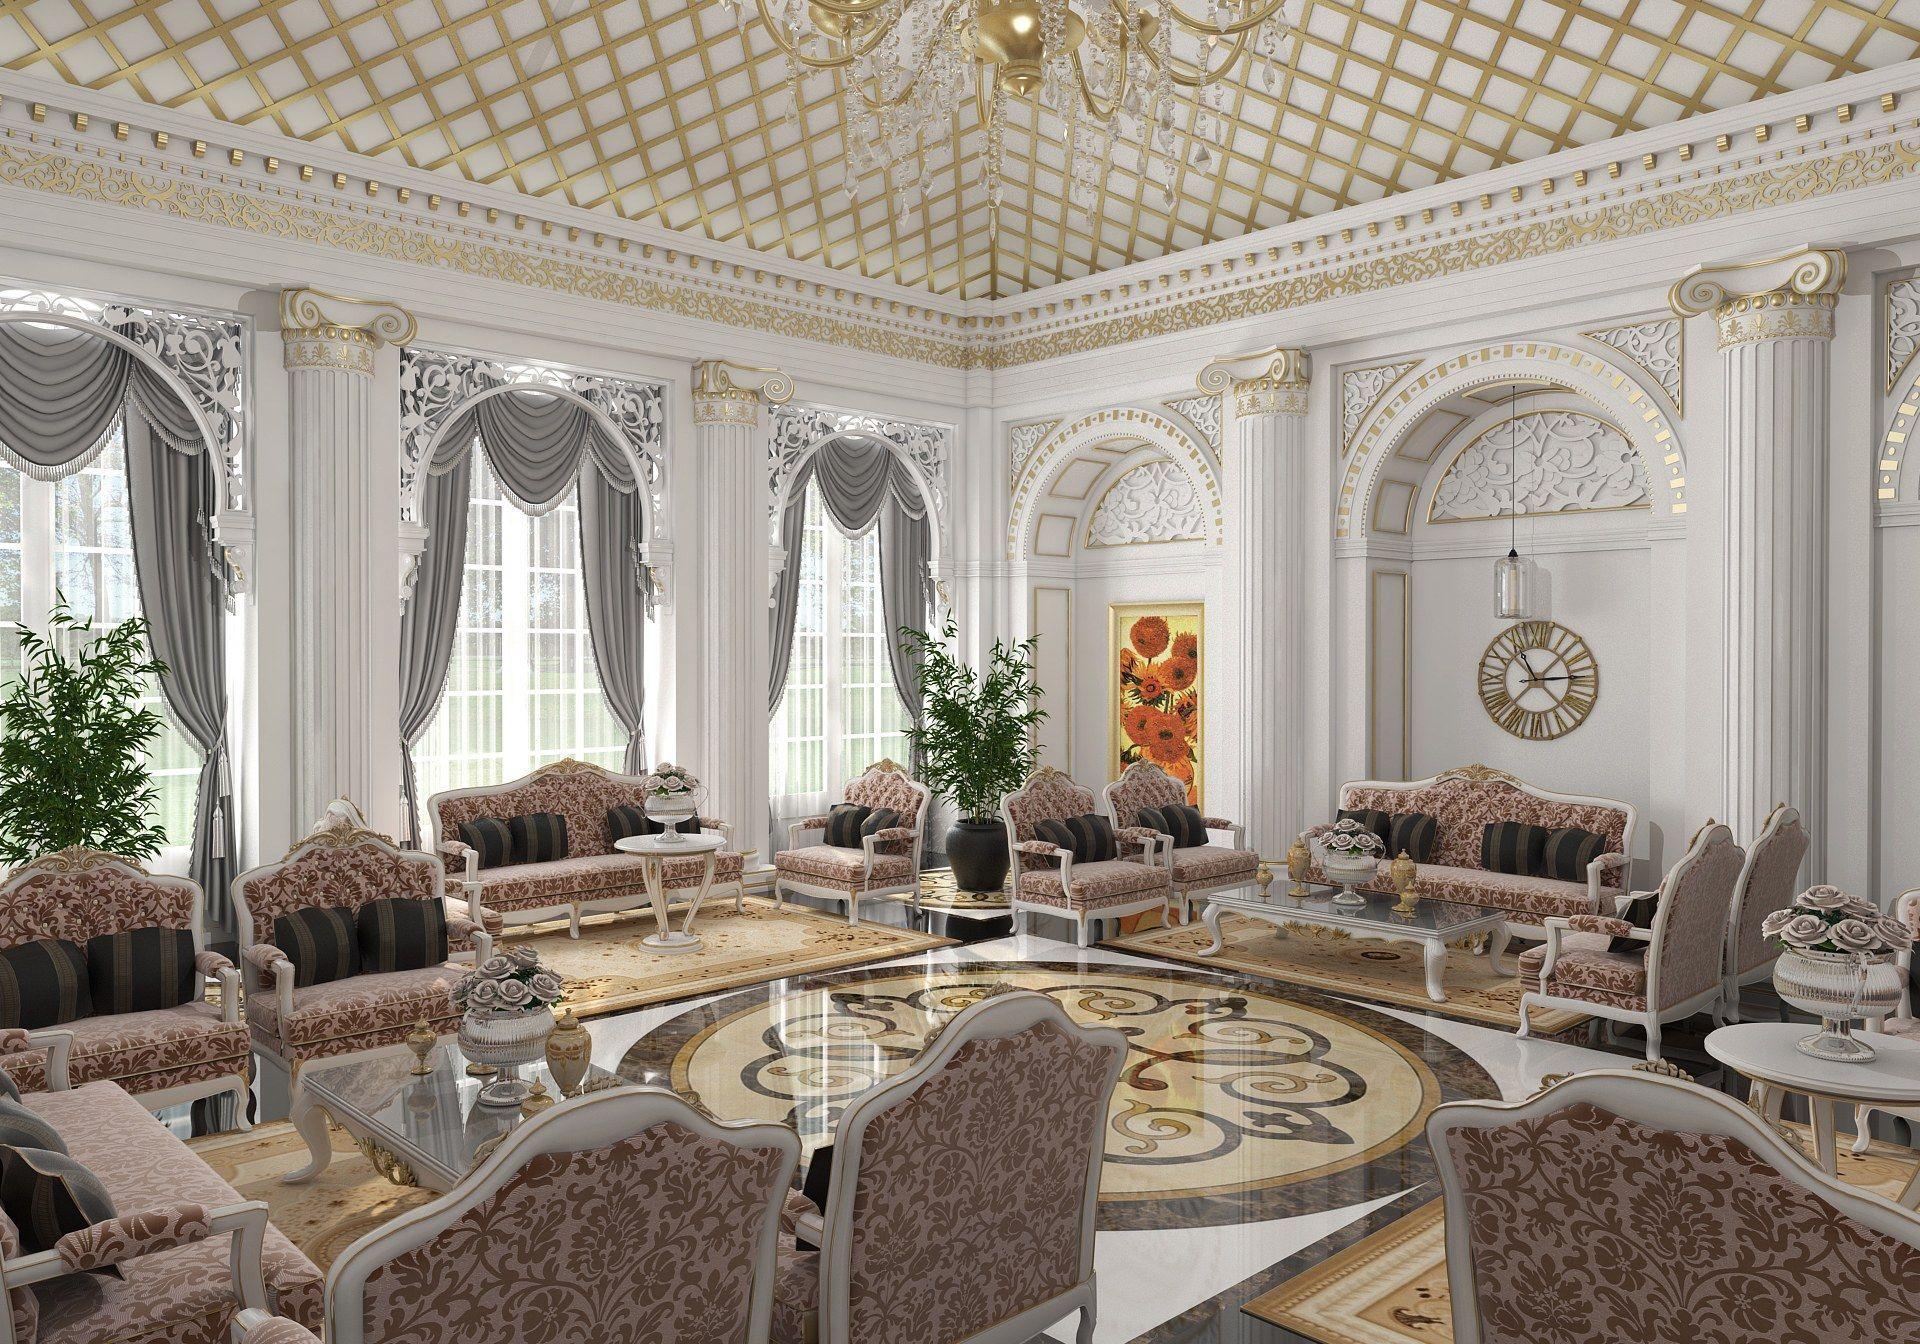 Classic living room 3d model free download home design - Classic home interior design photos ...